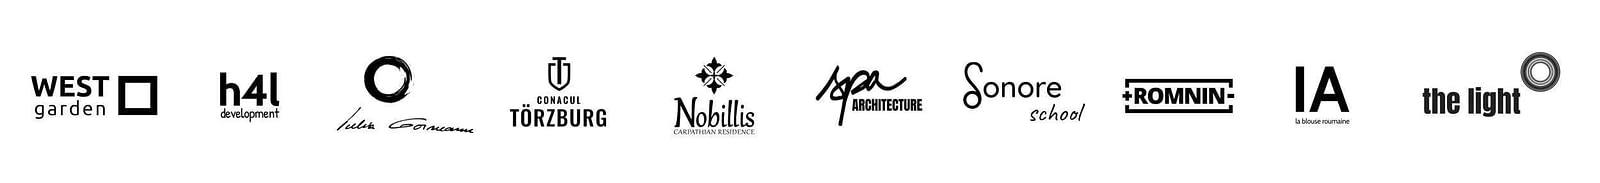 logo, logo design, design, logo for brands, by Toud, creare logo, branding